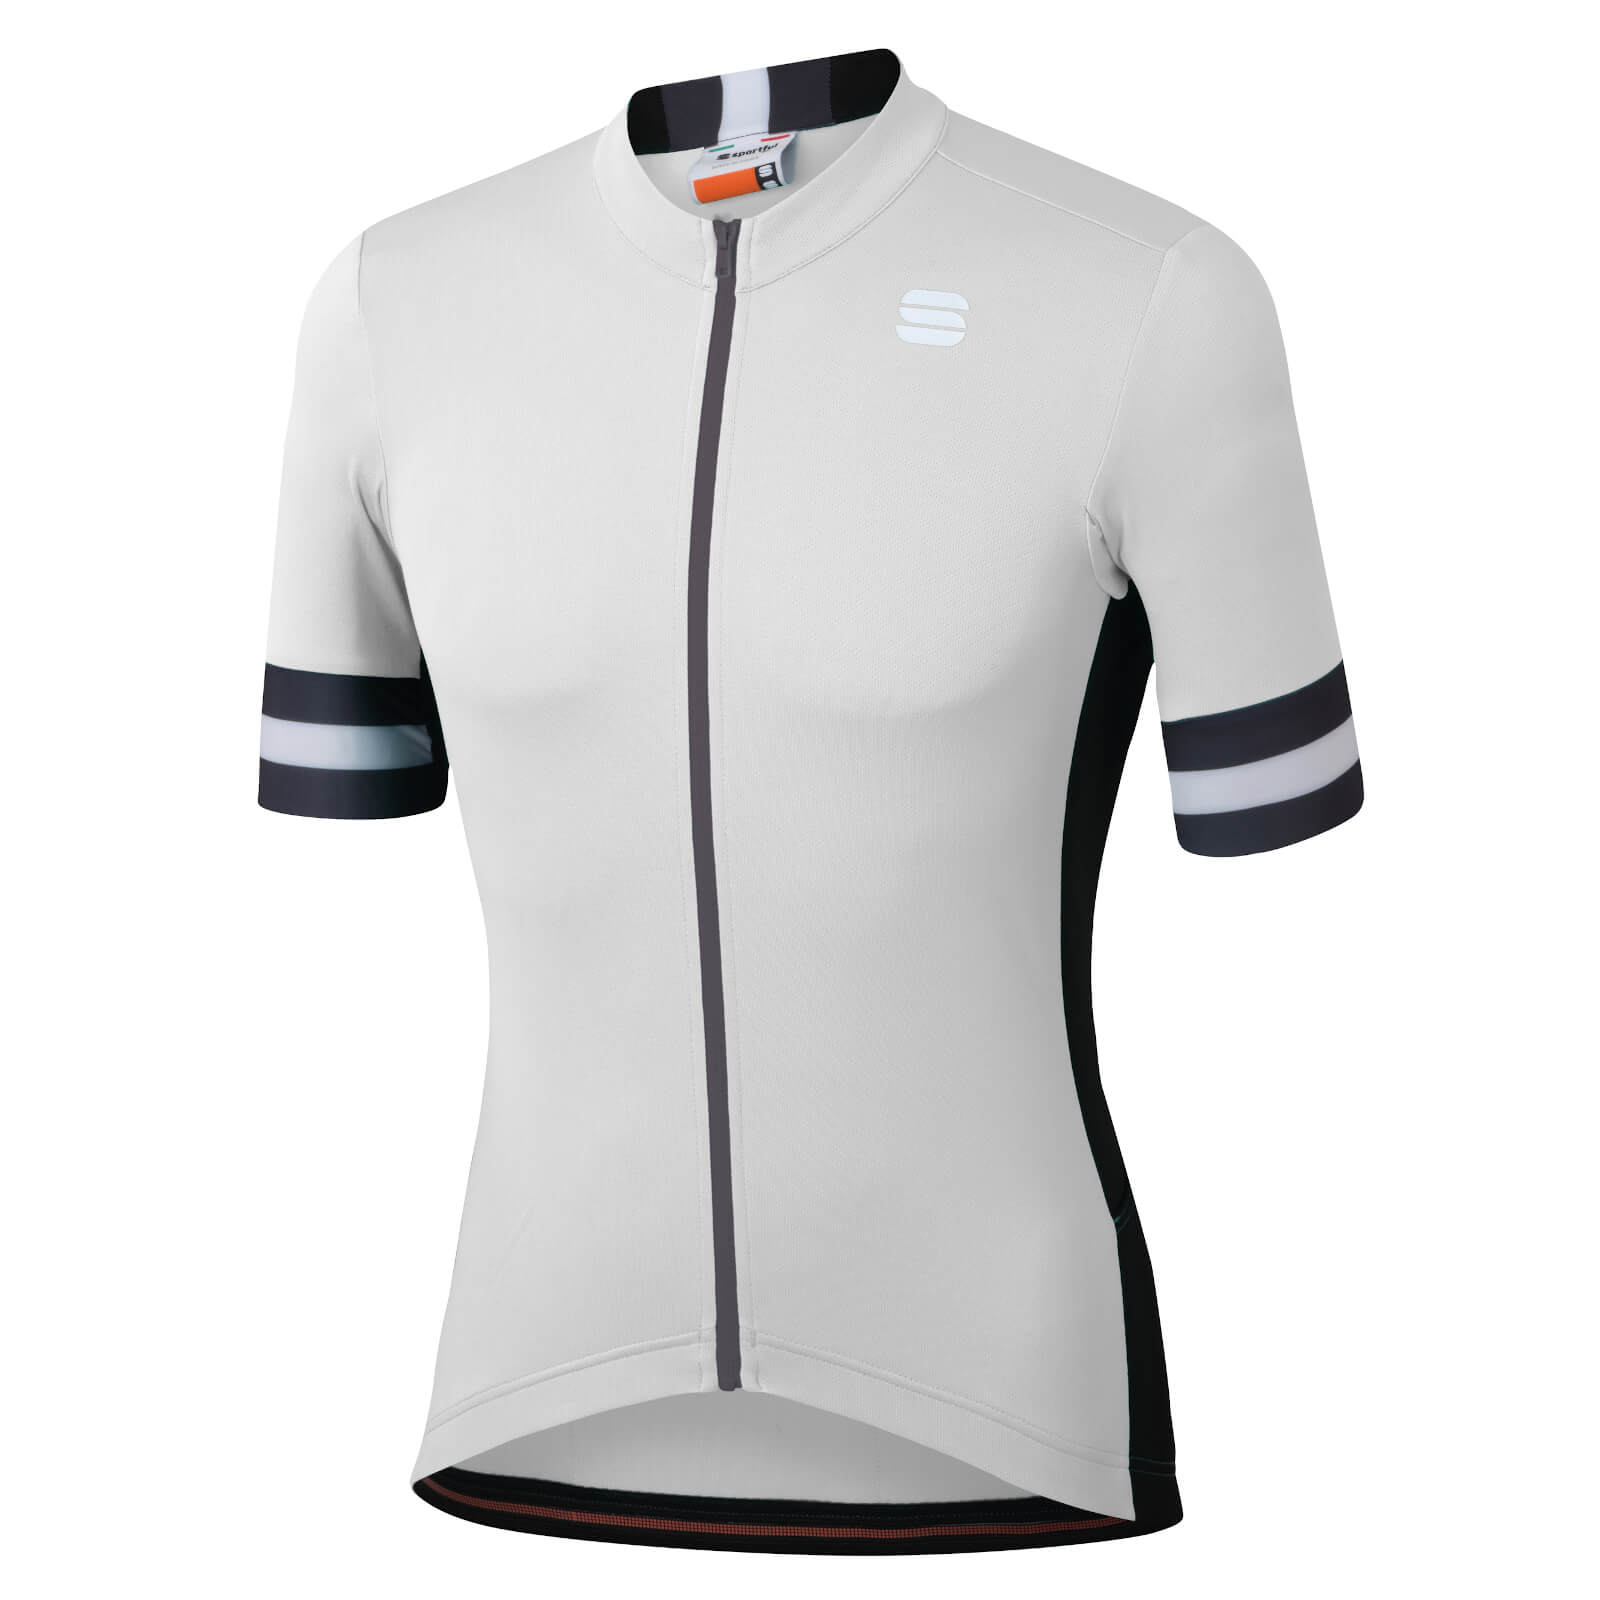 Sportful Kite Jersey - S - White